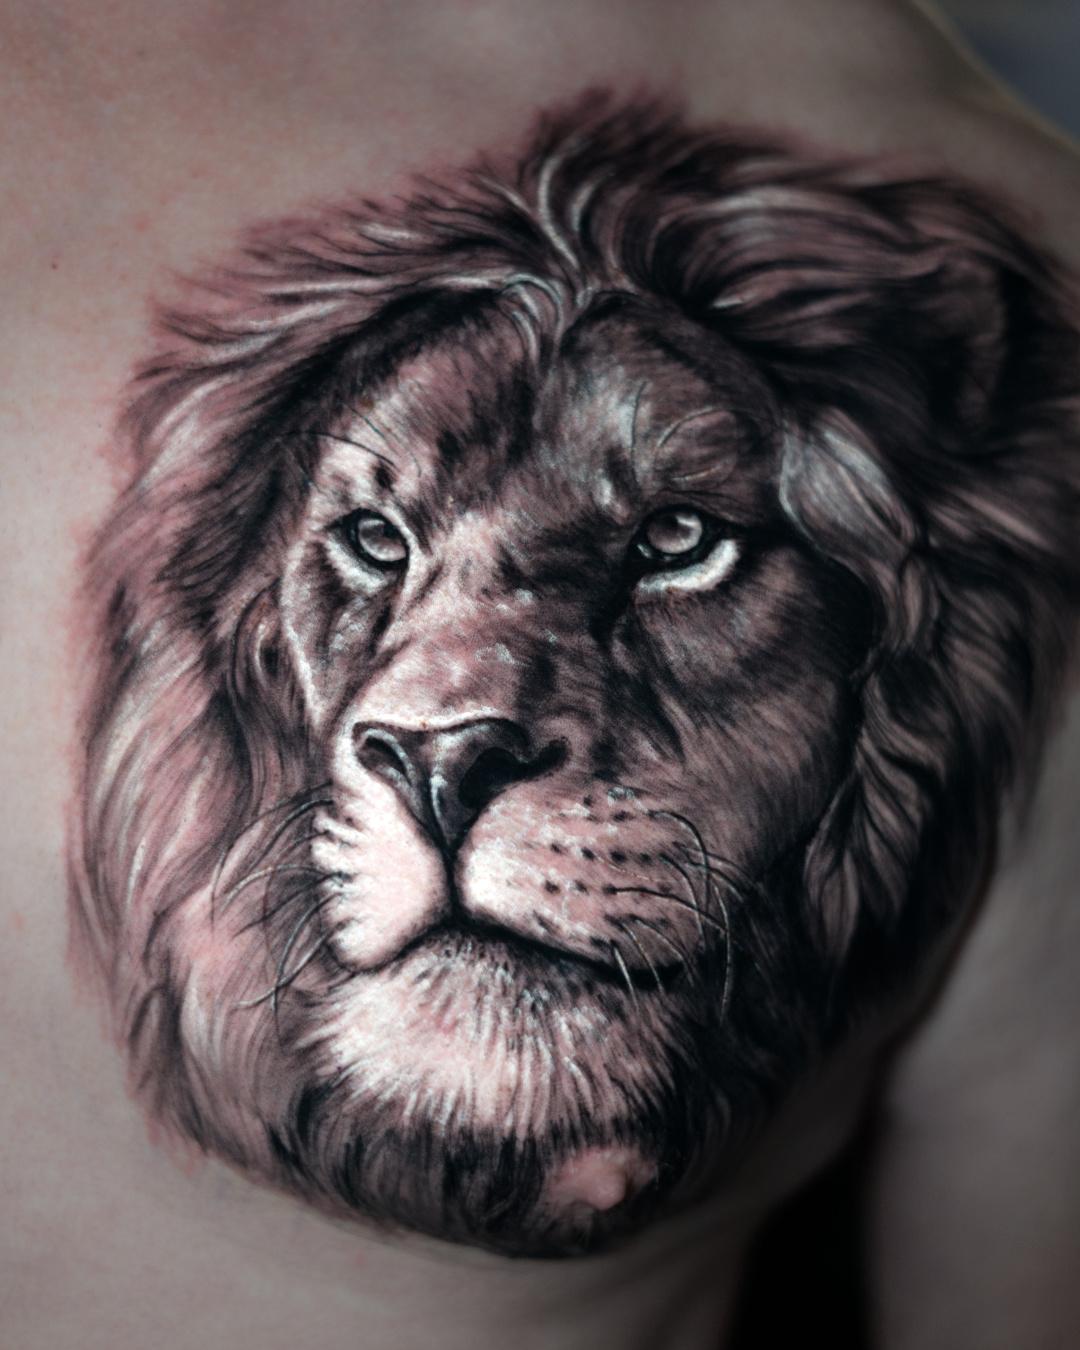 Tattoo tatuaje Alexis Epalza black and grey realistic Lion leon animal